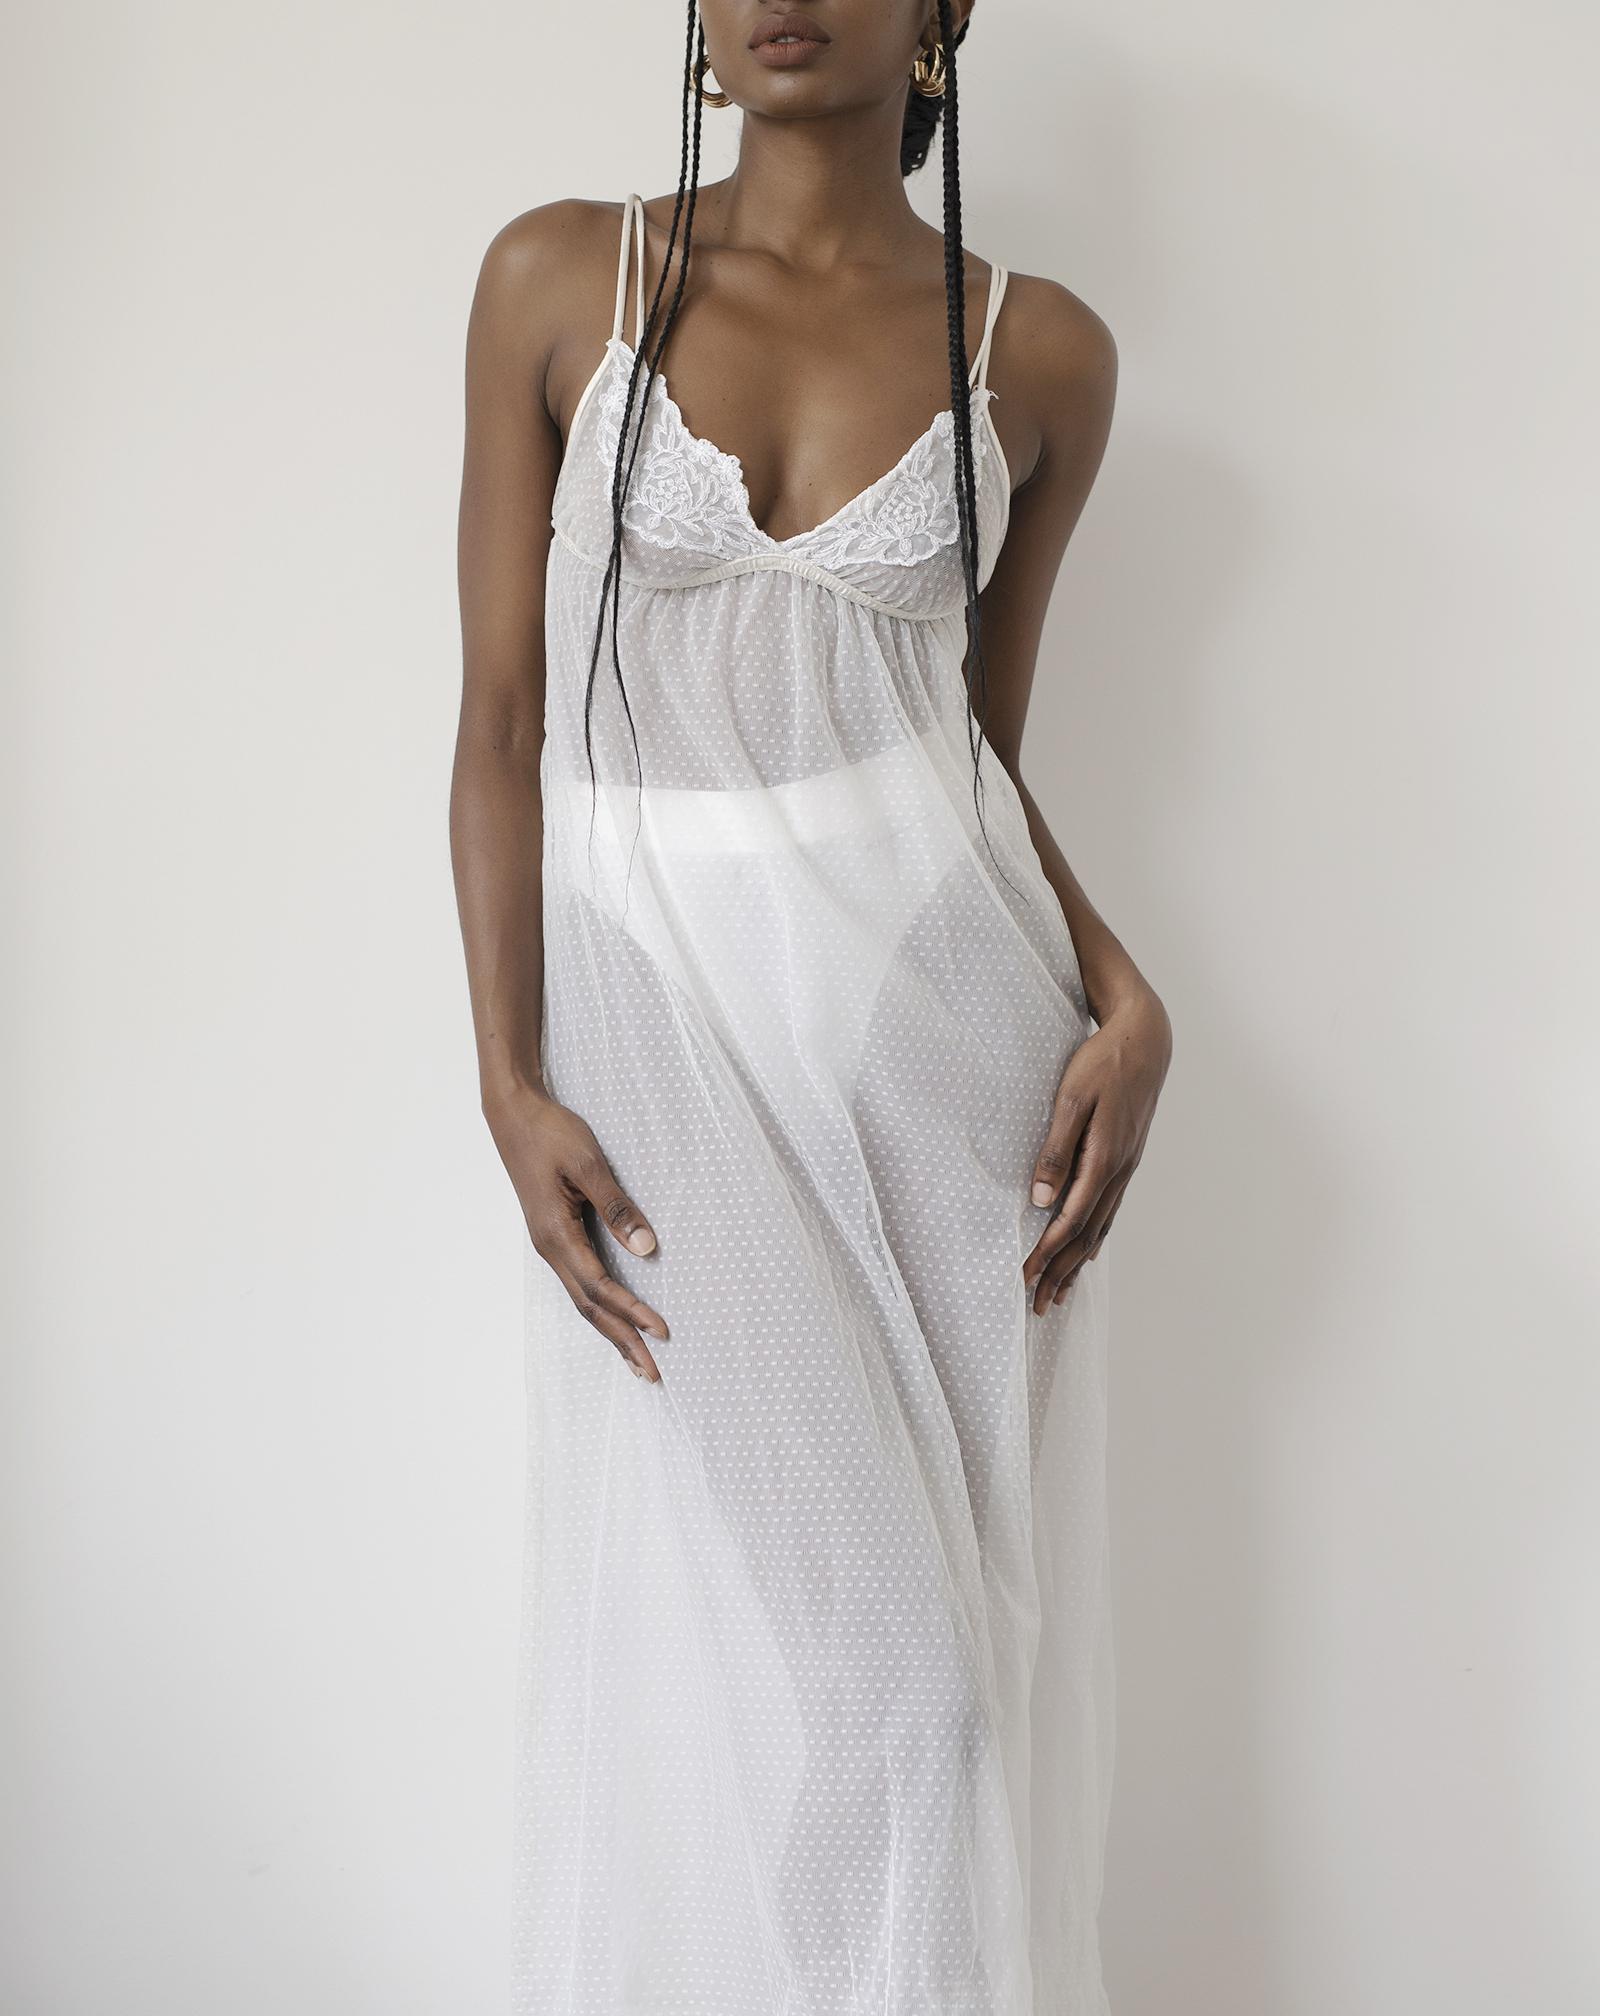 sheer nightgown dress -2.jpg